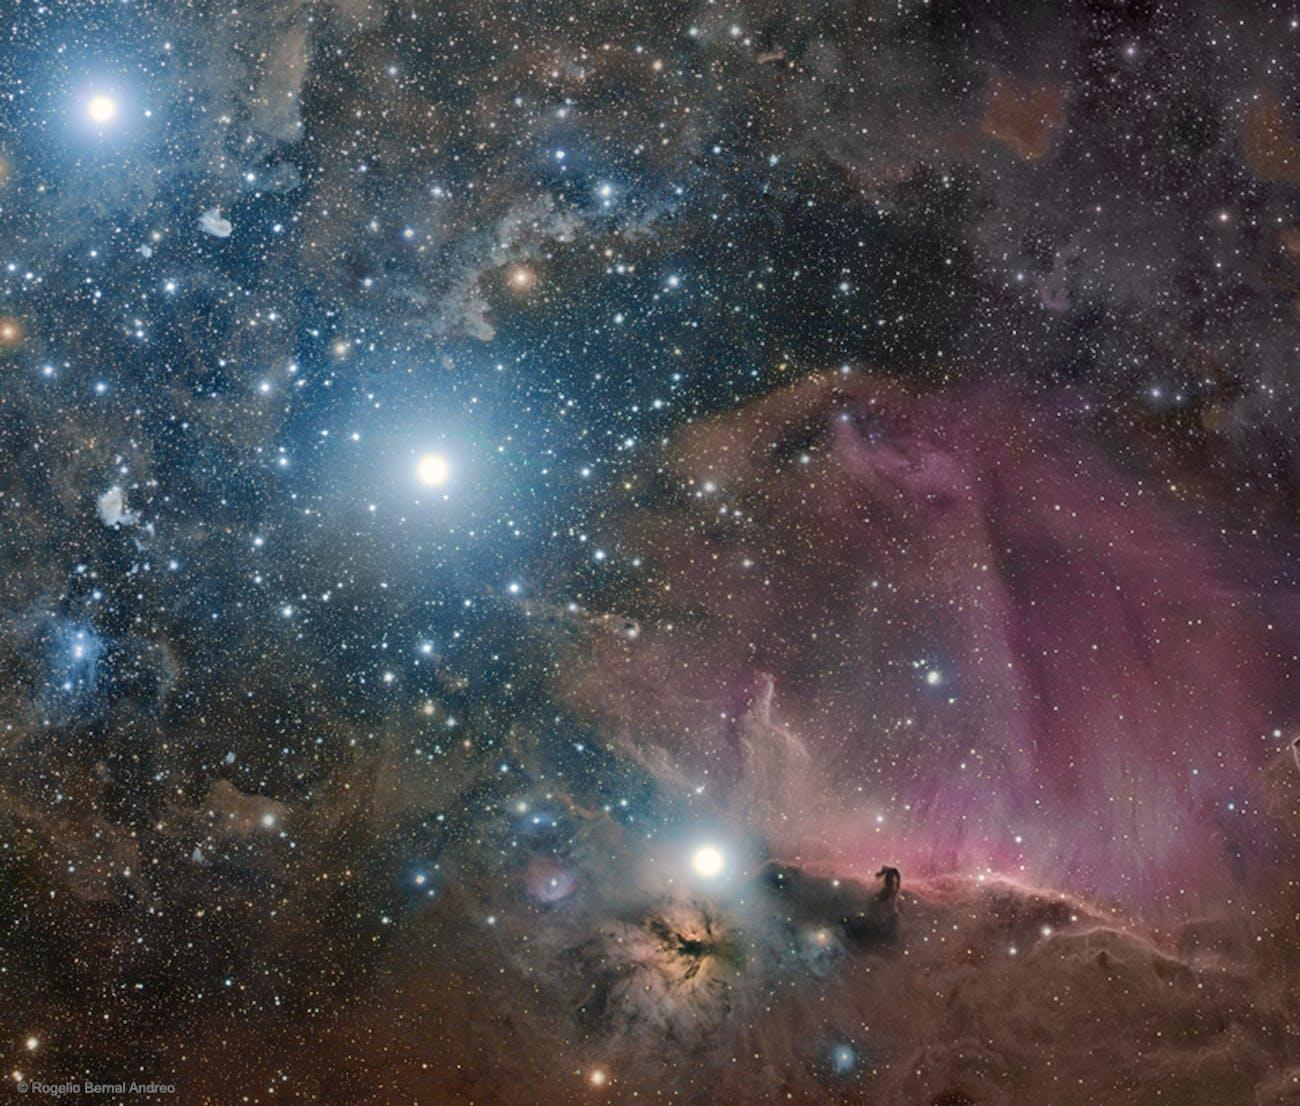 Orion NASA astronomy